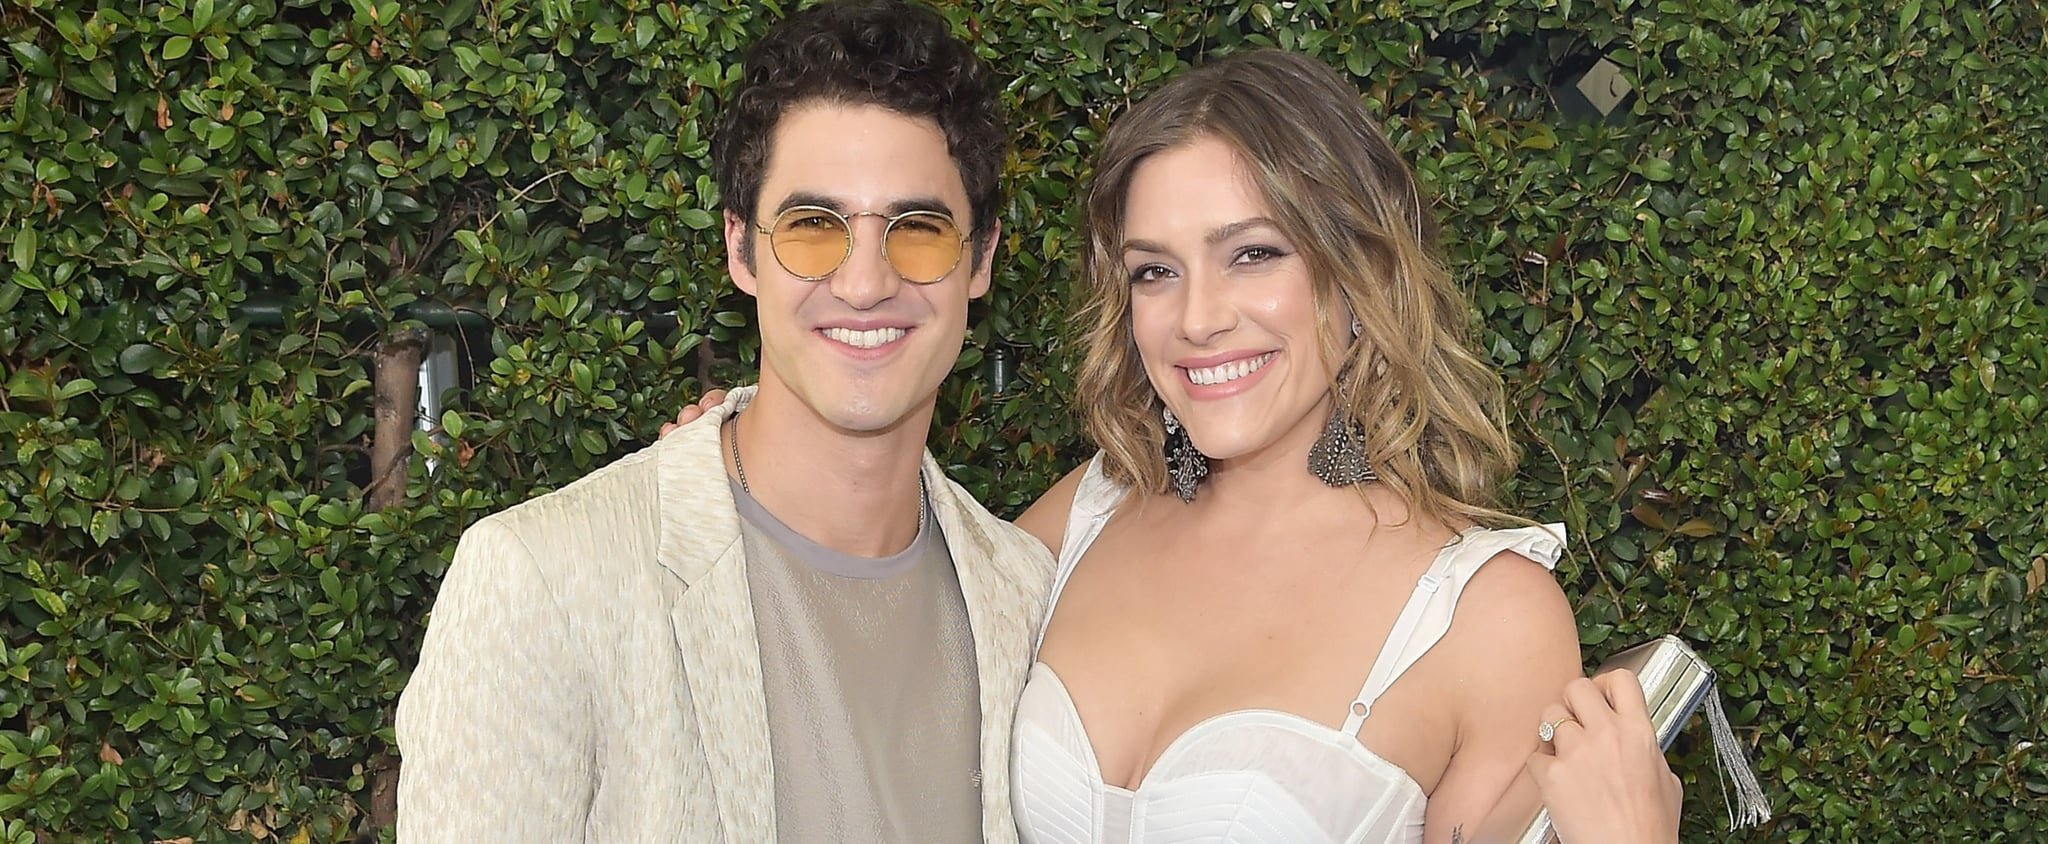 Darren Criss and Mia Swier Married